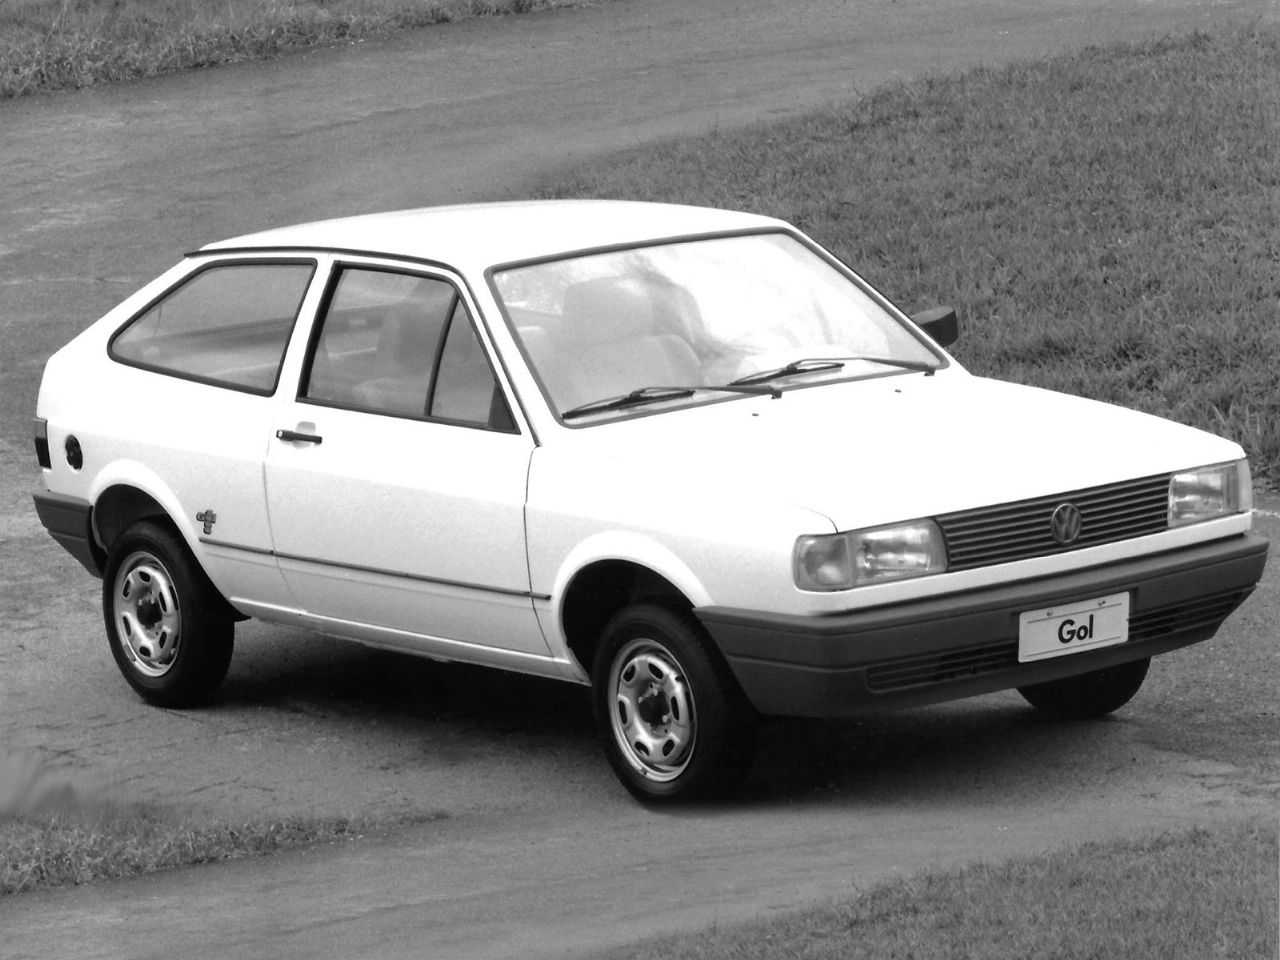 VolkswagenGol 1992 - ângulo frontal